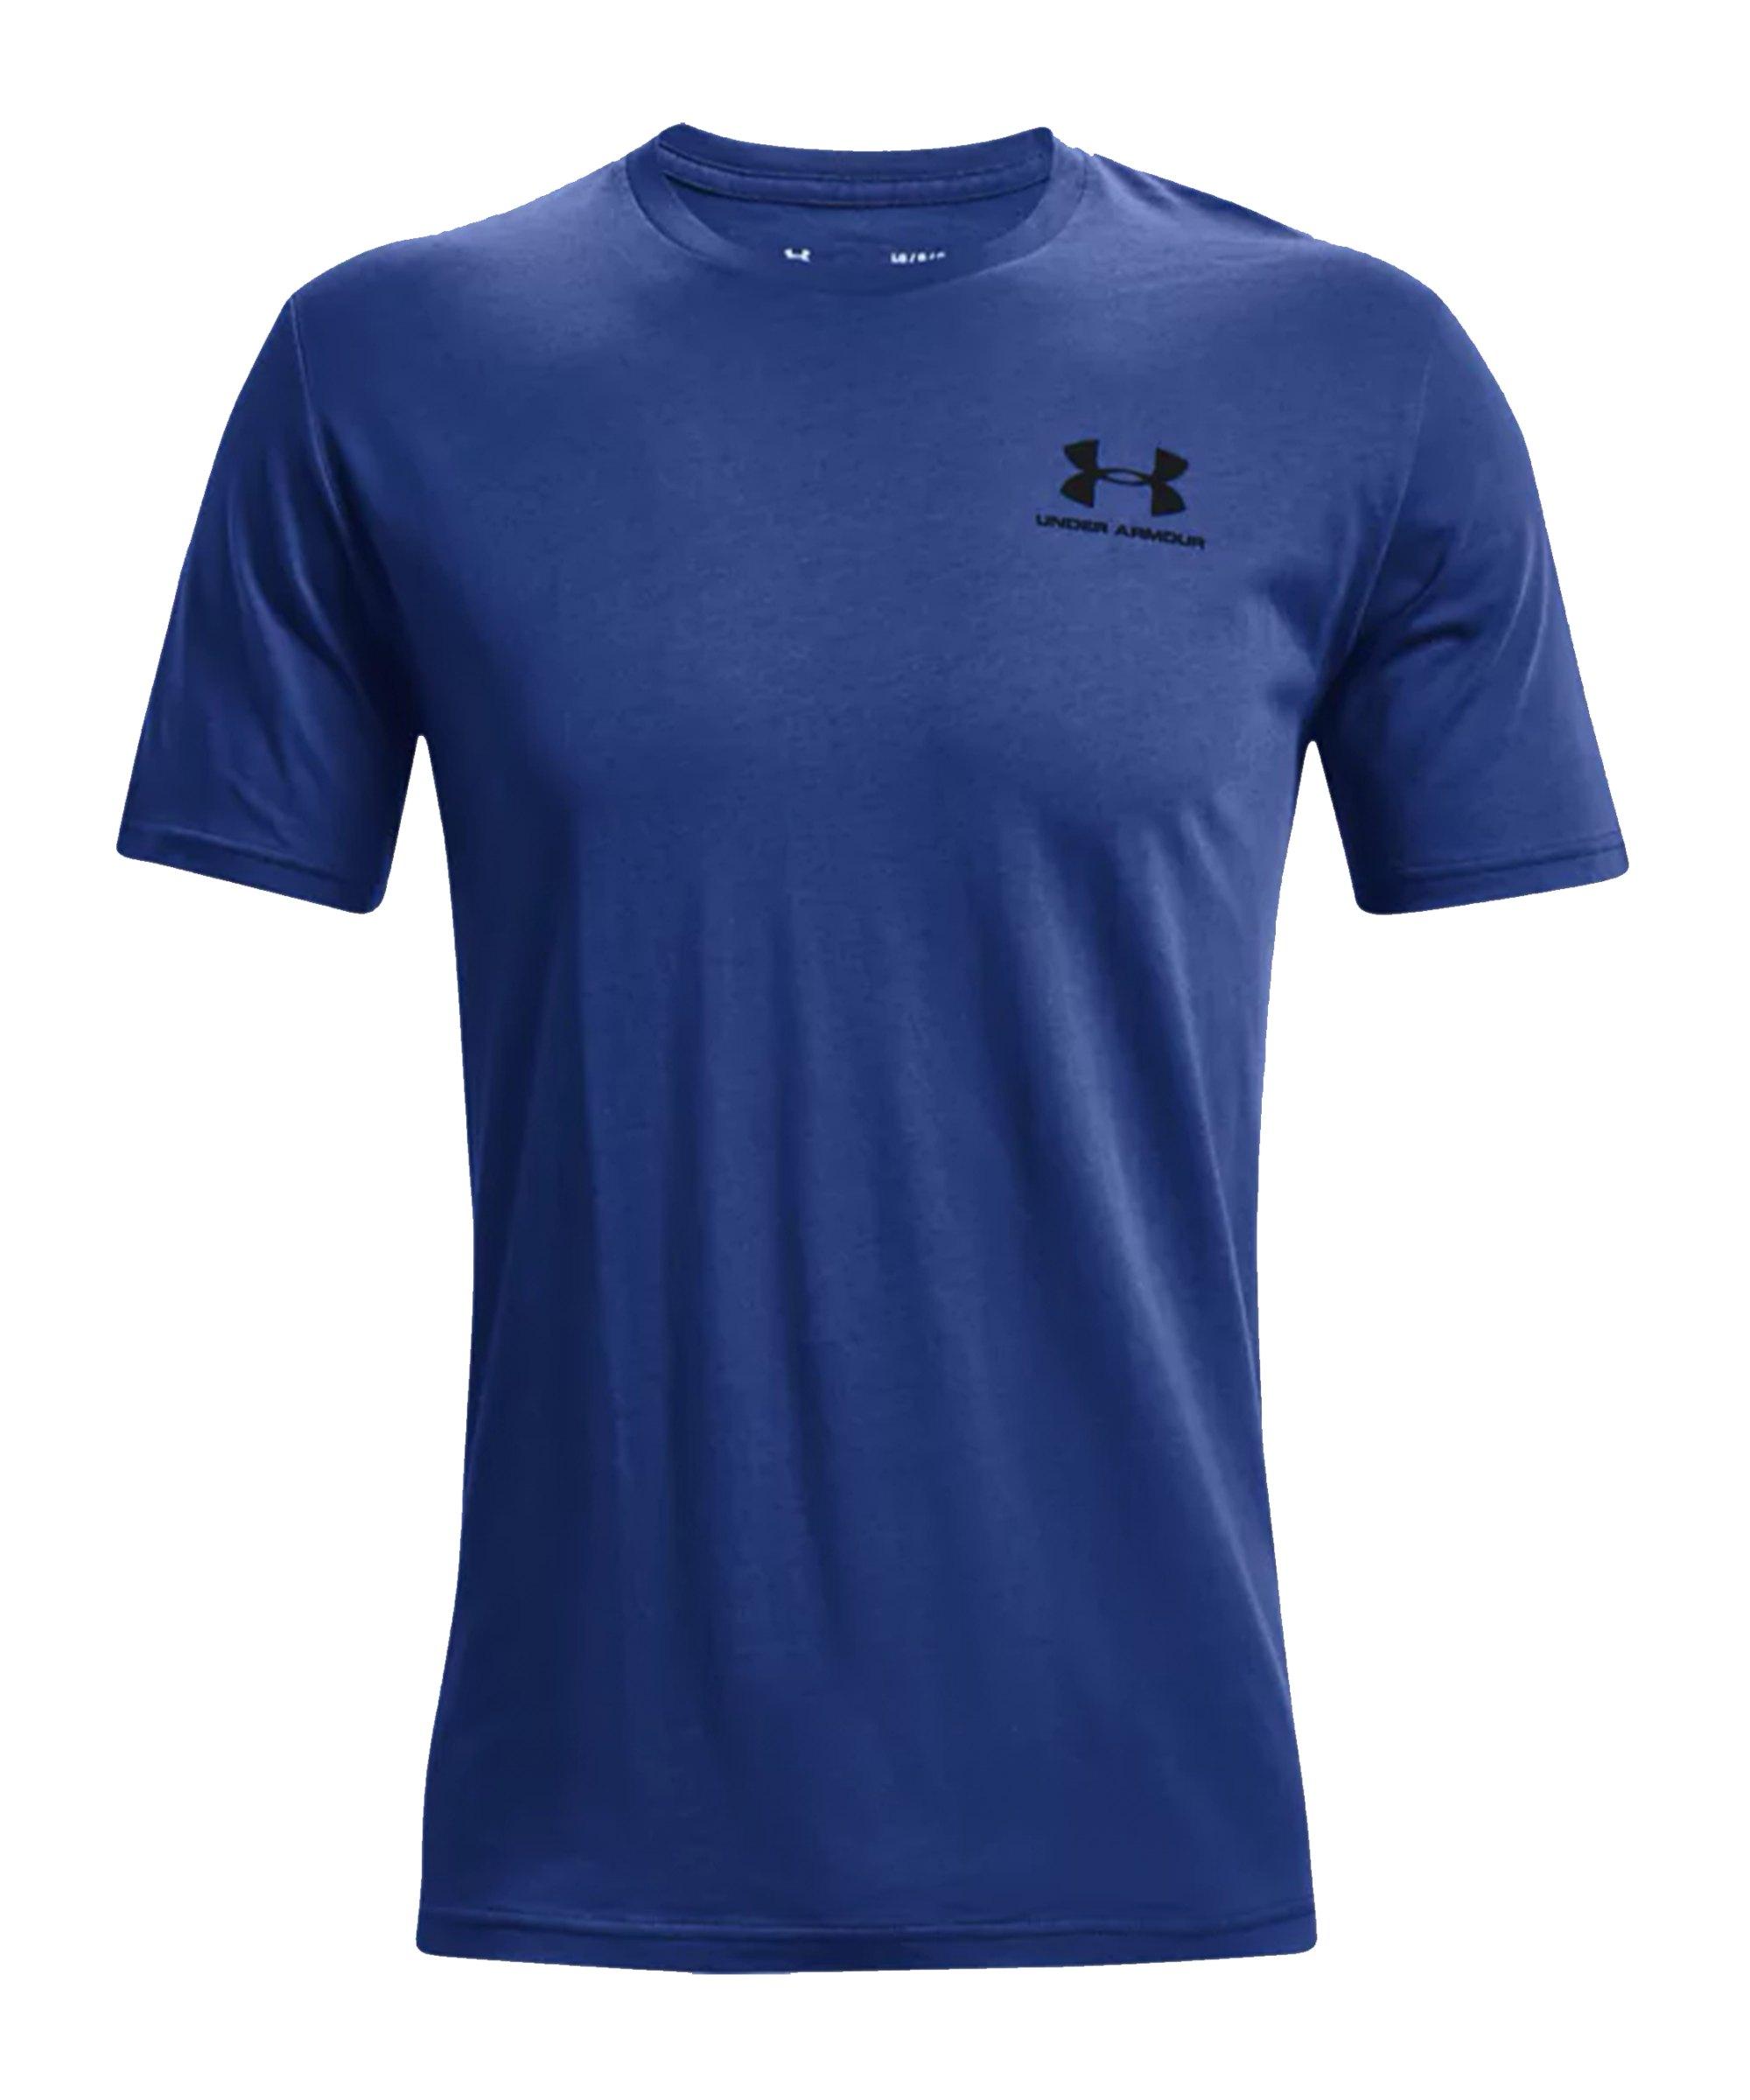 Under Armour Sportstyle Left Chest T-Shirt F432 - blau